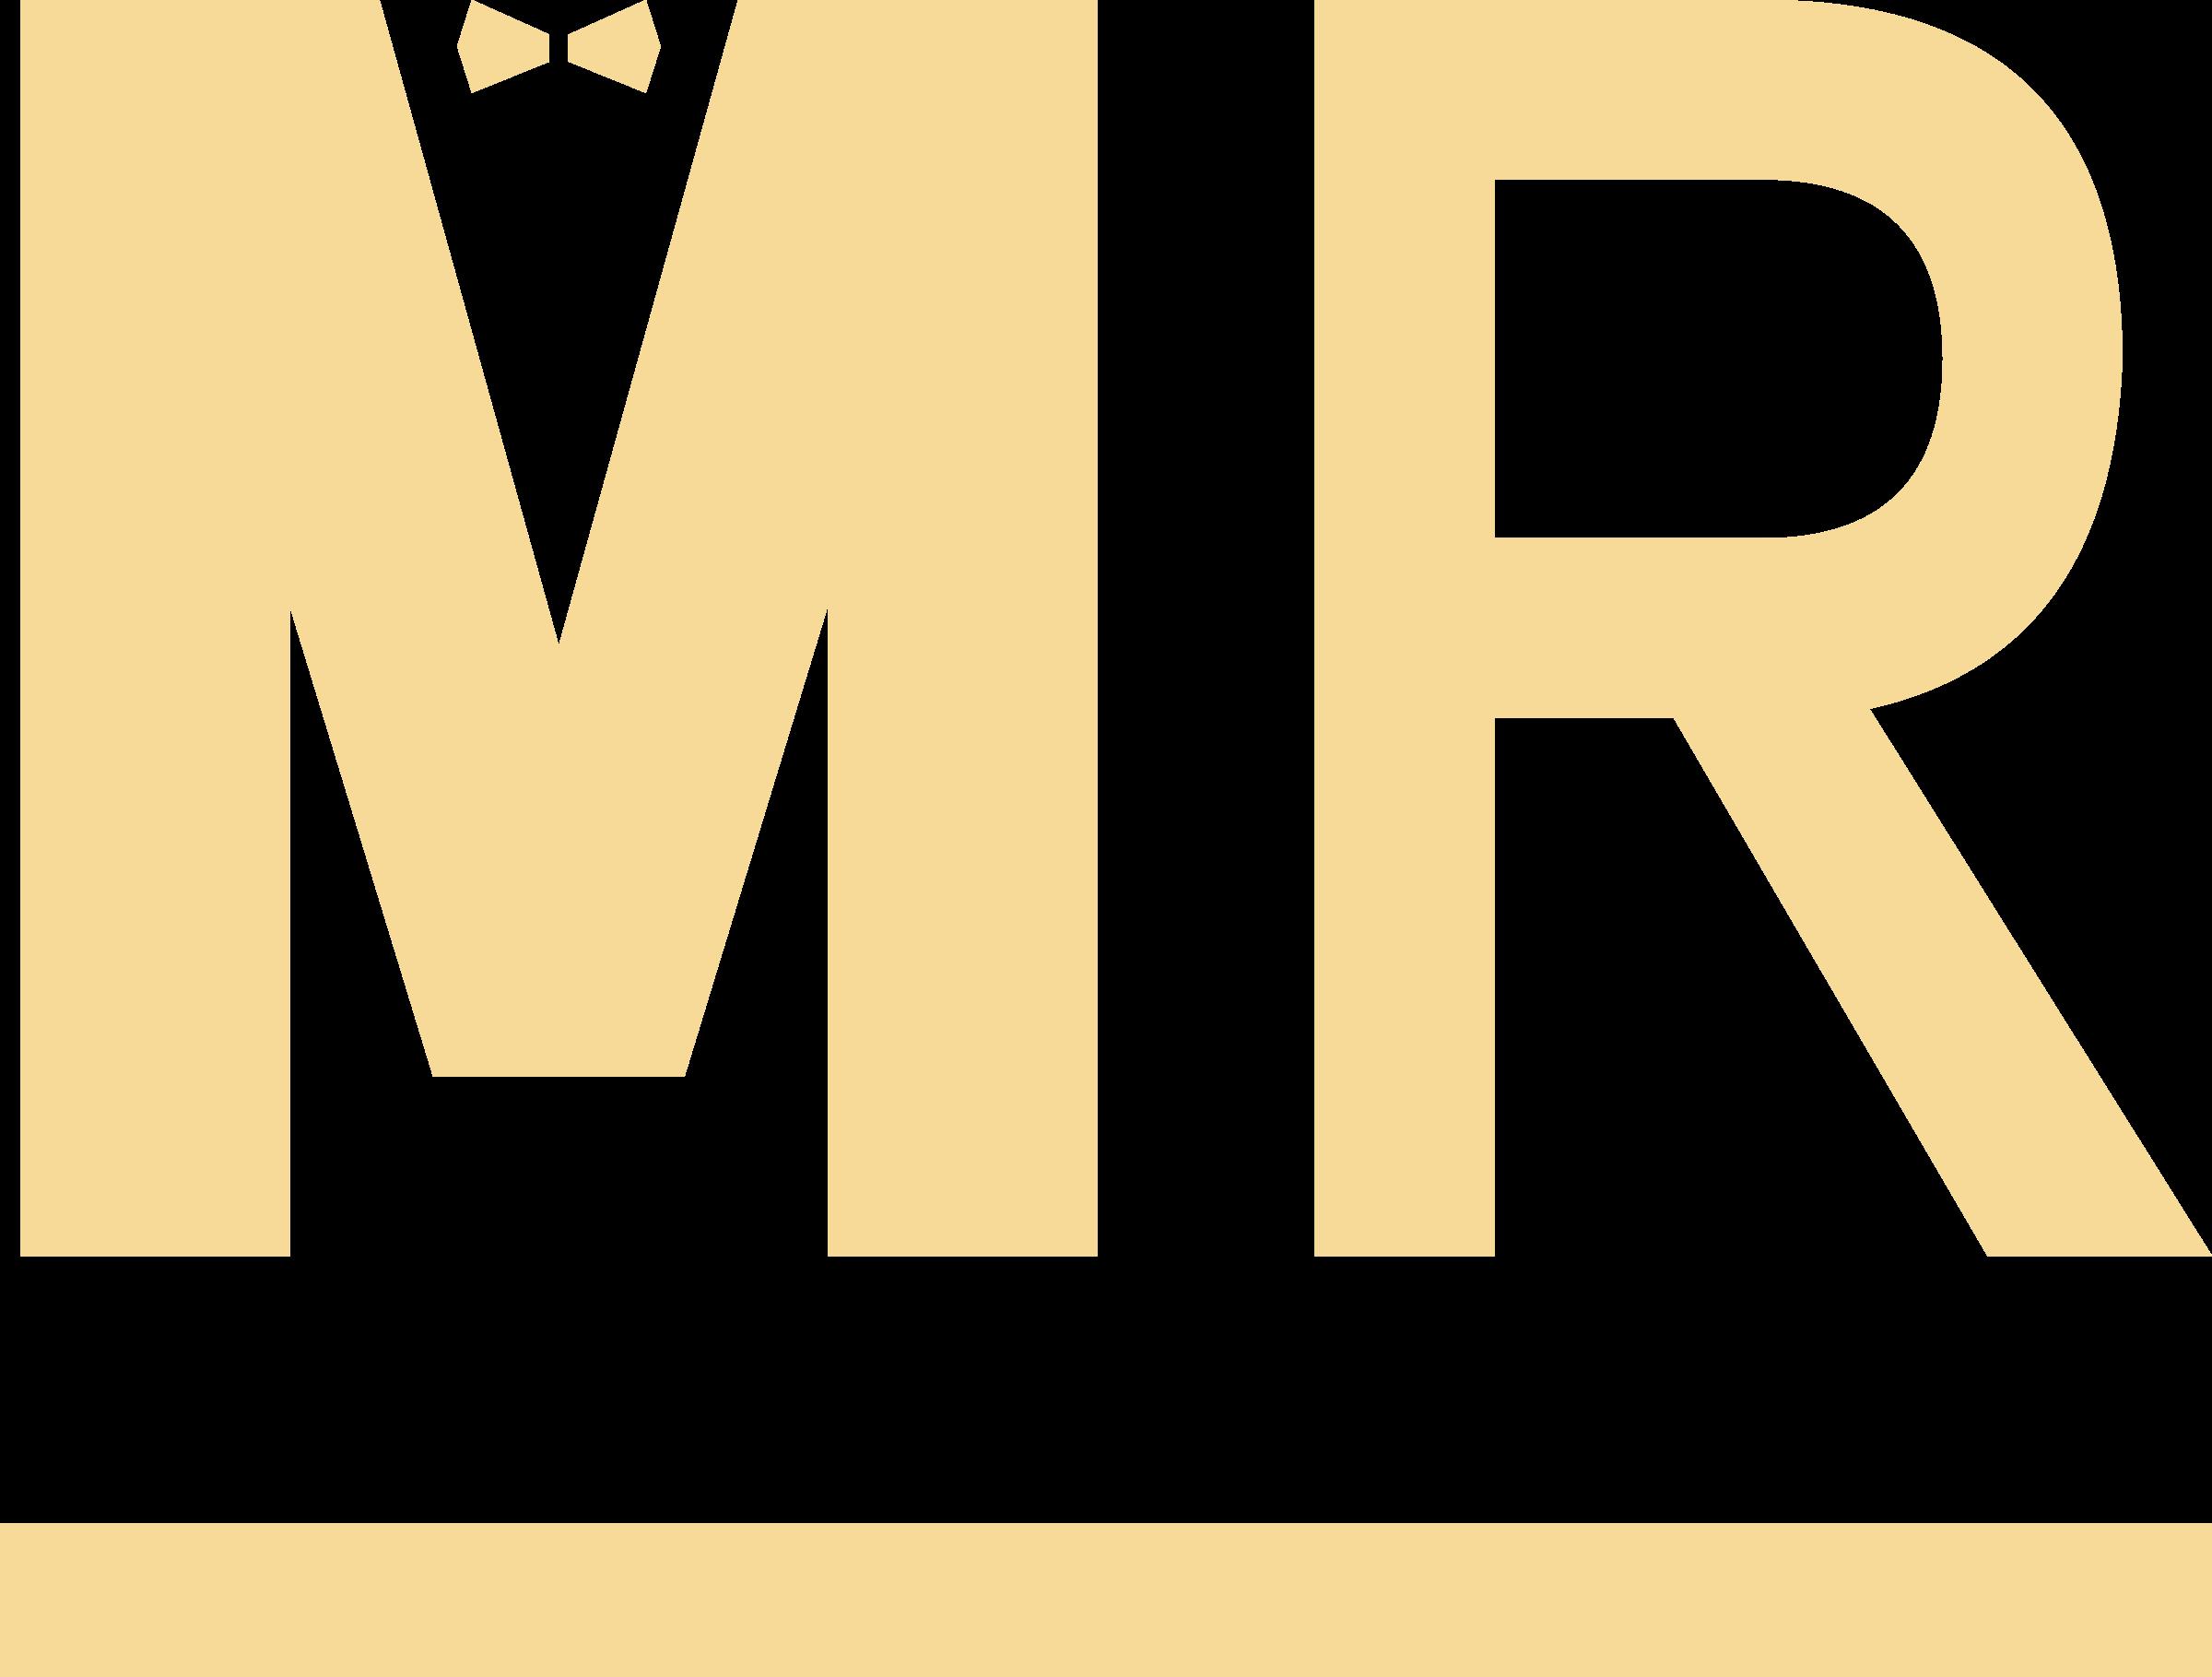 Mr clipart svg. Mannenrantsoen logo png transparent